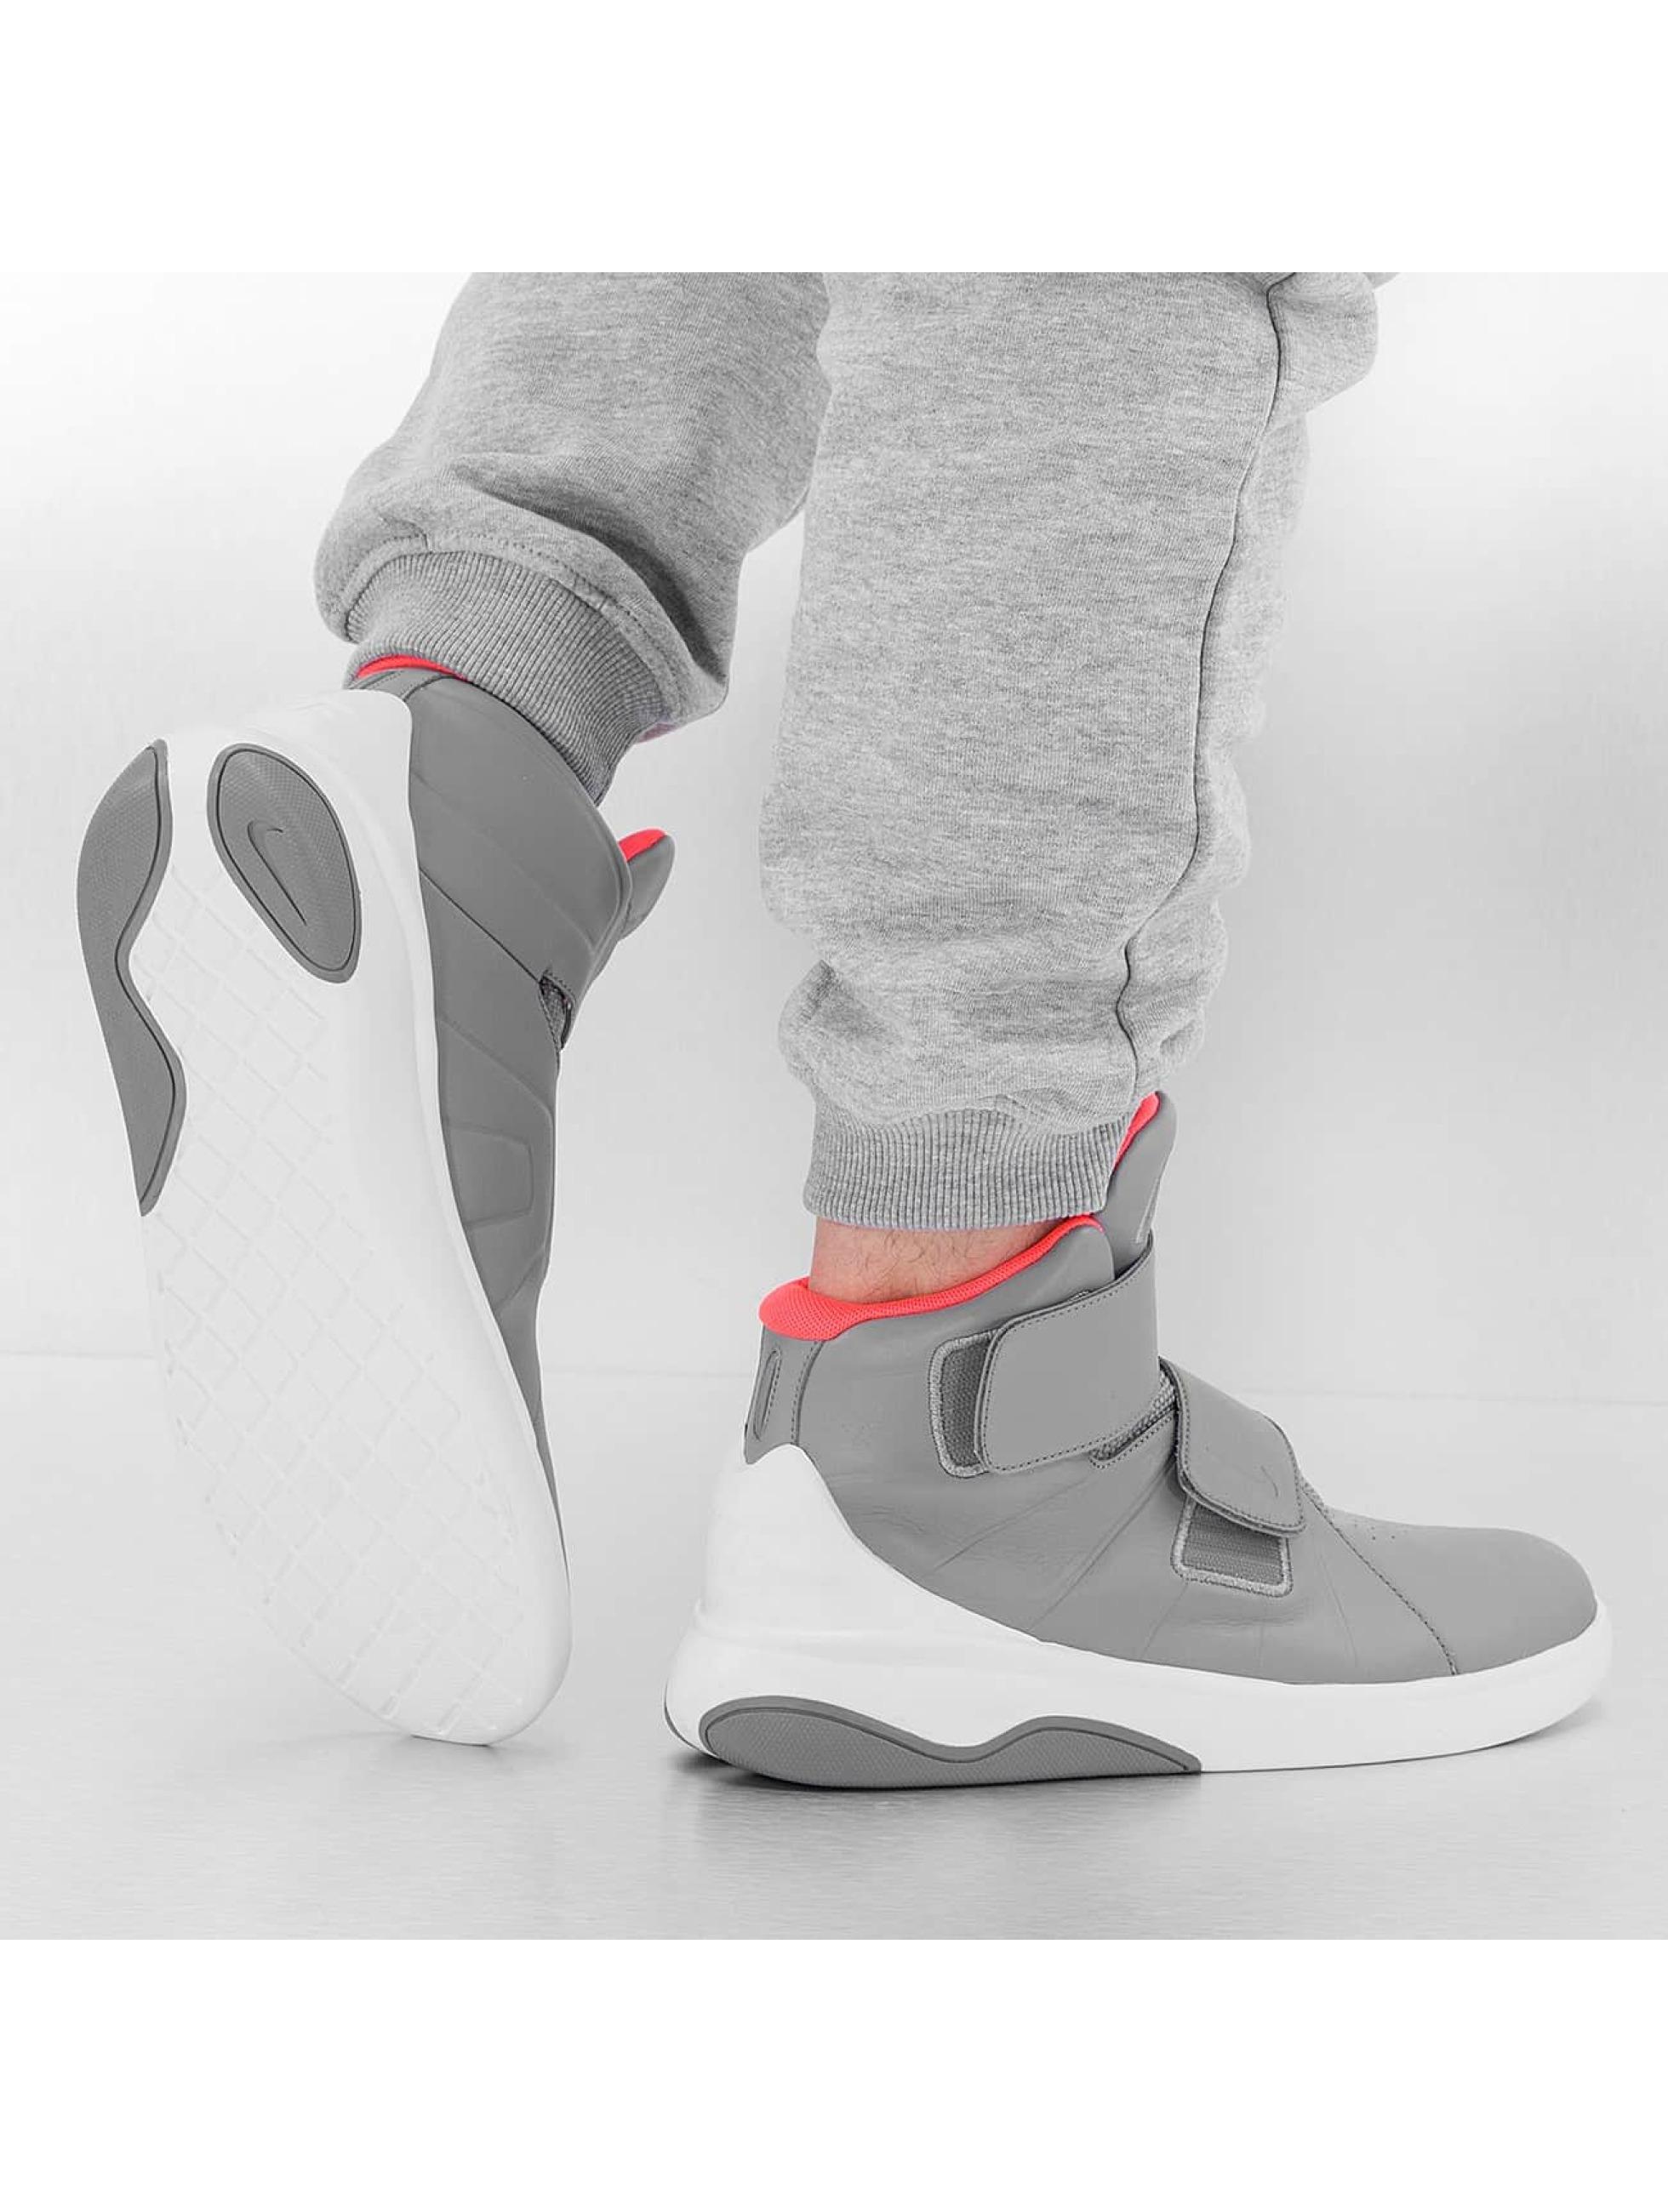 Nike Chaussures MARXMAN Nike